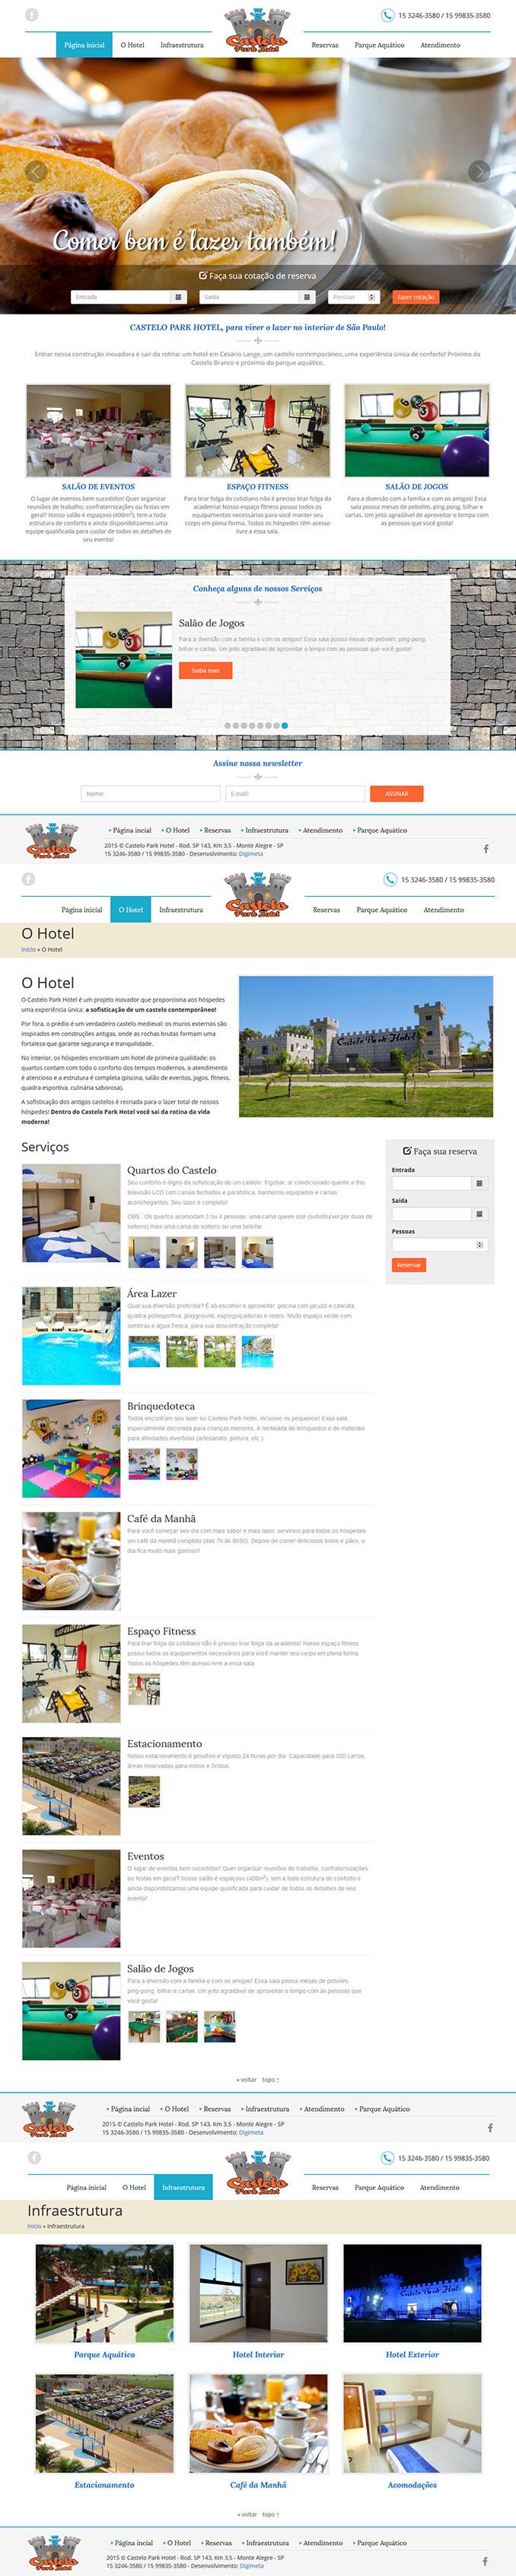 Castelo Park Hotel